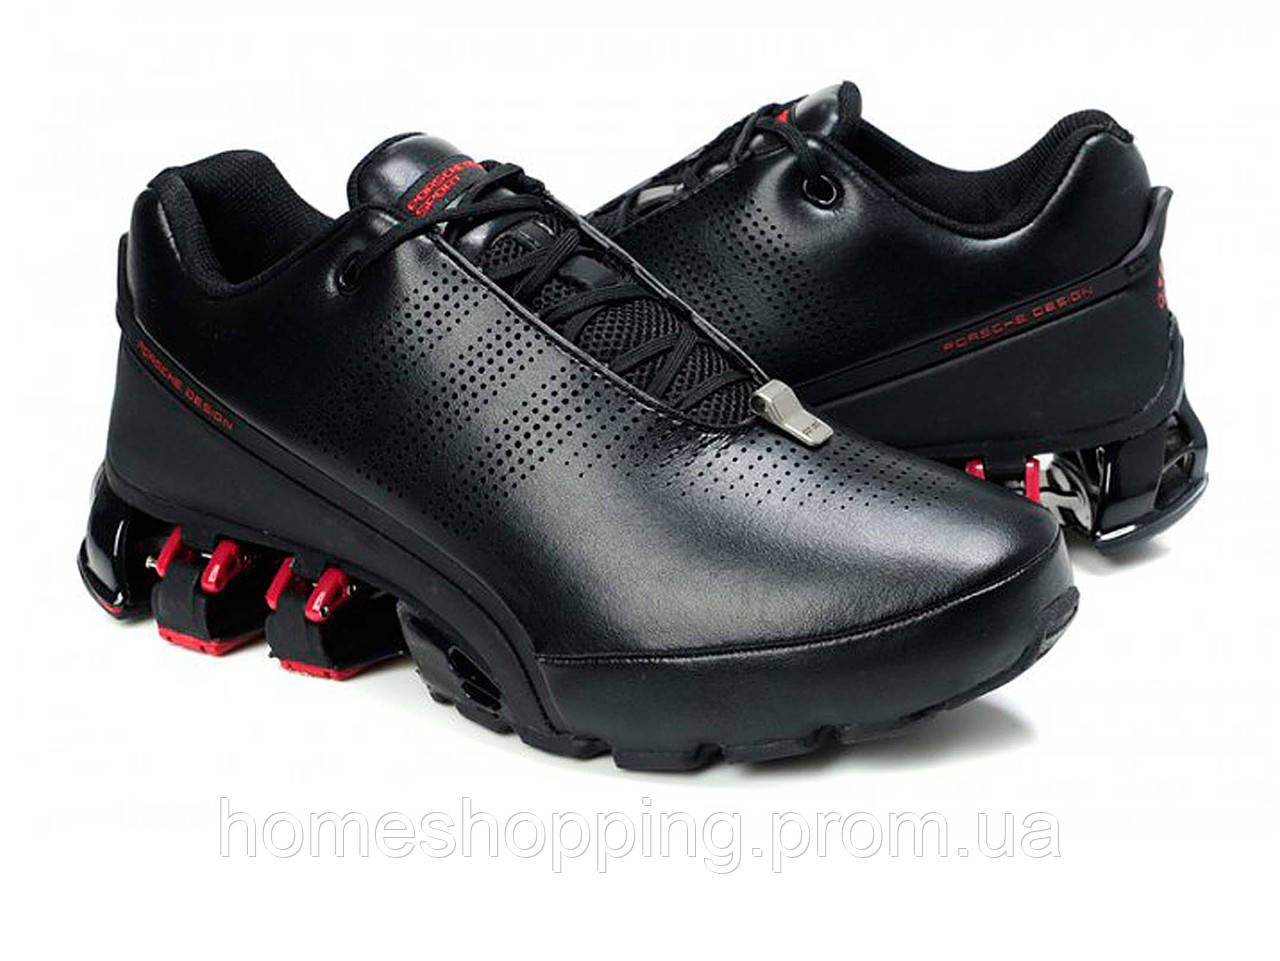 Кроссовки мужские Adidas Porsche Design P5000 Bounce S2 Leather Black Red